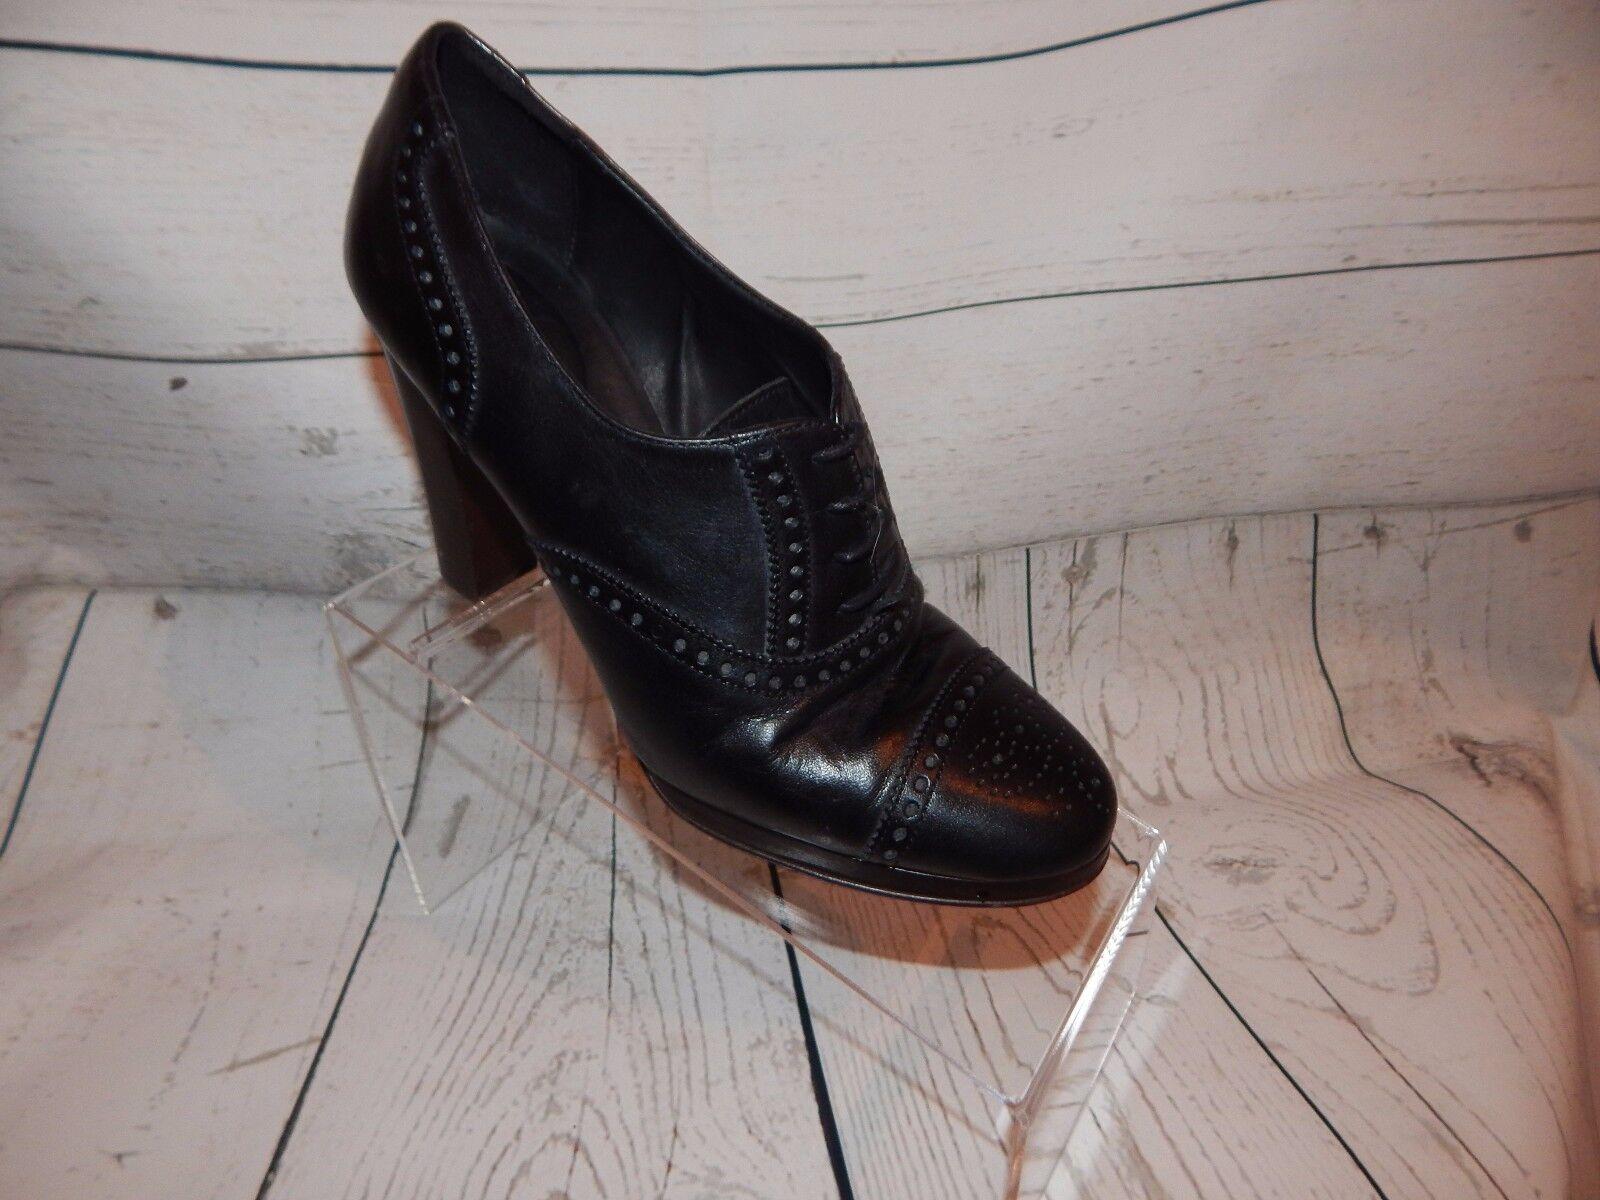 J Crew nero Leather avvioie Cap Toe Heels Made in  Wouomo Dimensione 7.5